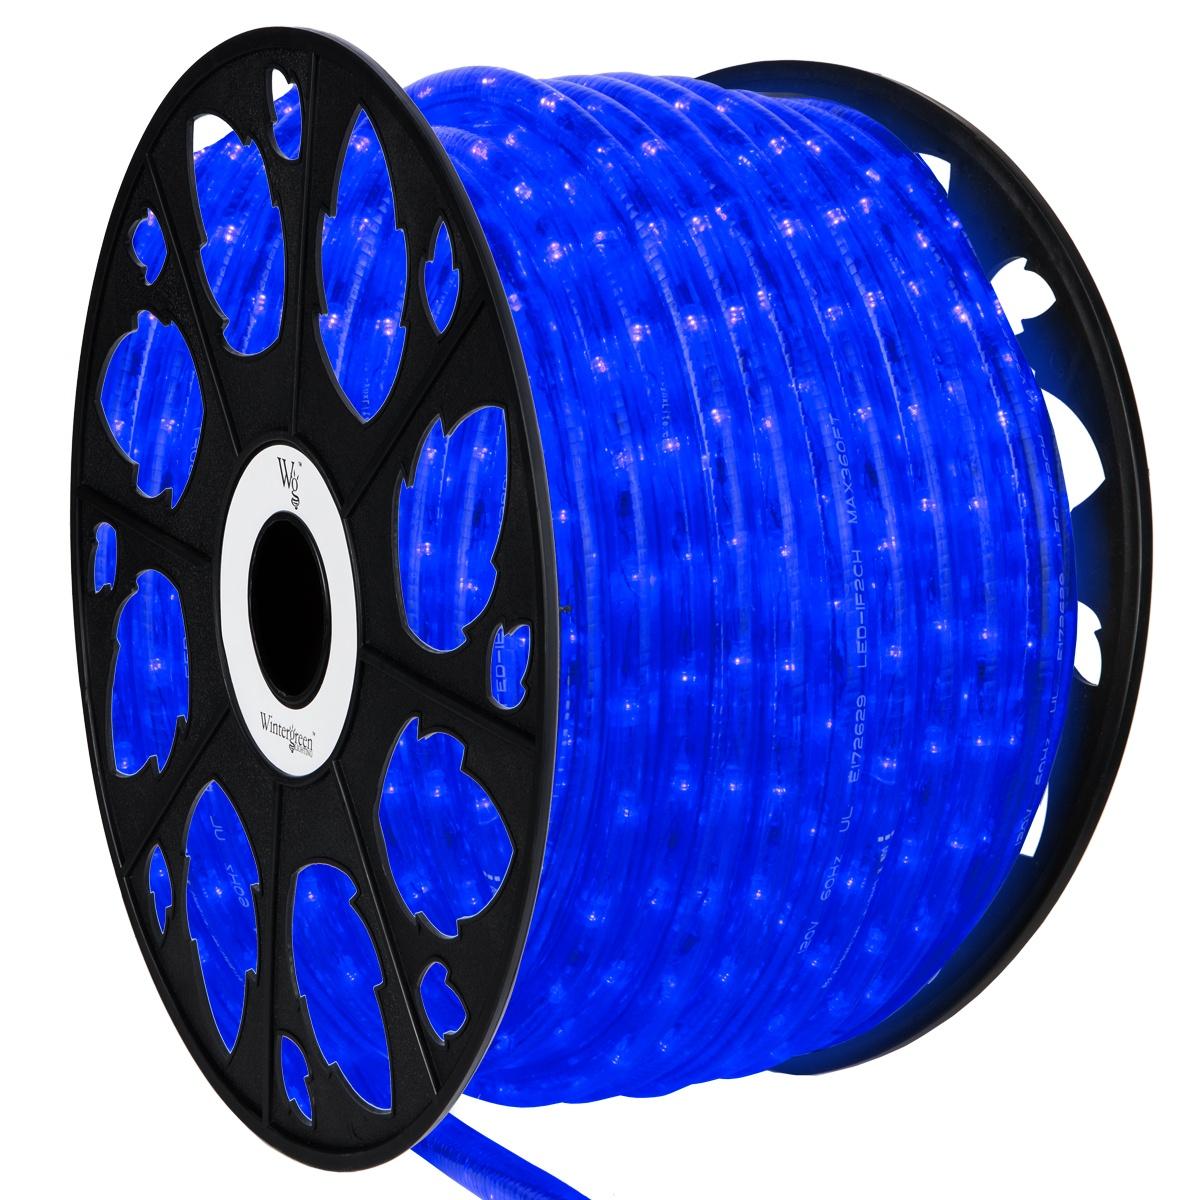 Led Rope Lights 150 Blue Led Rope Light Commercial Spool 120 Volt